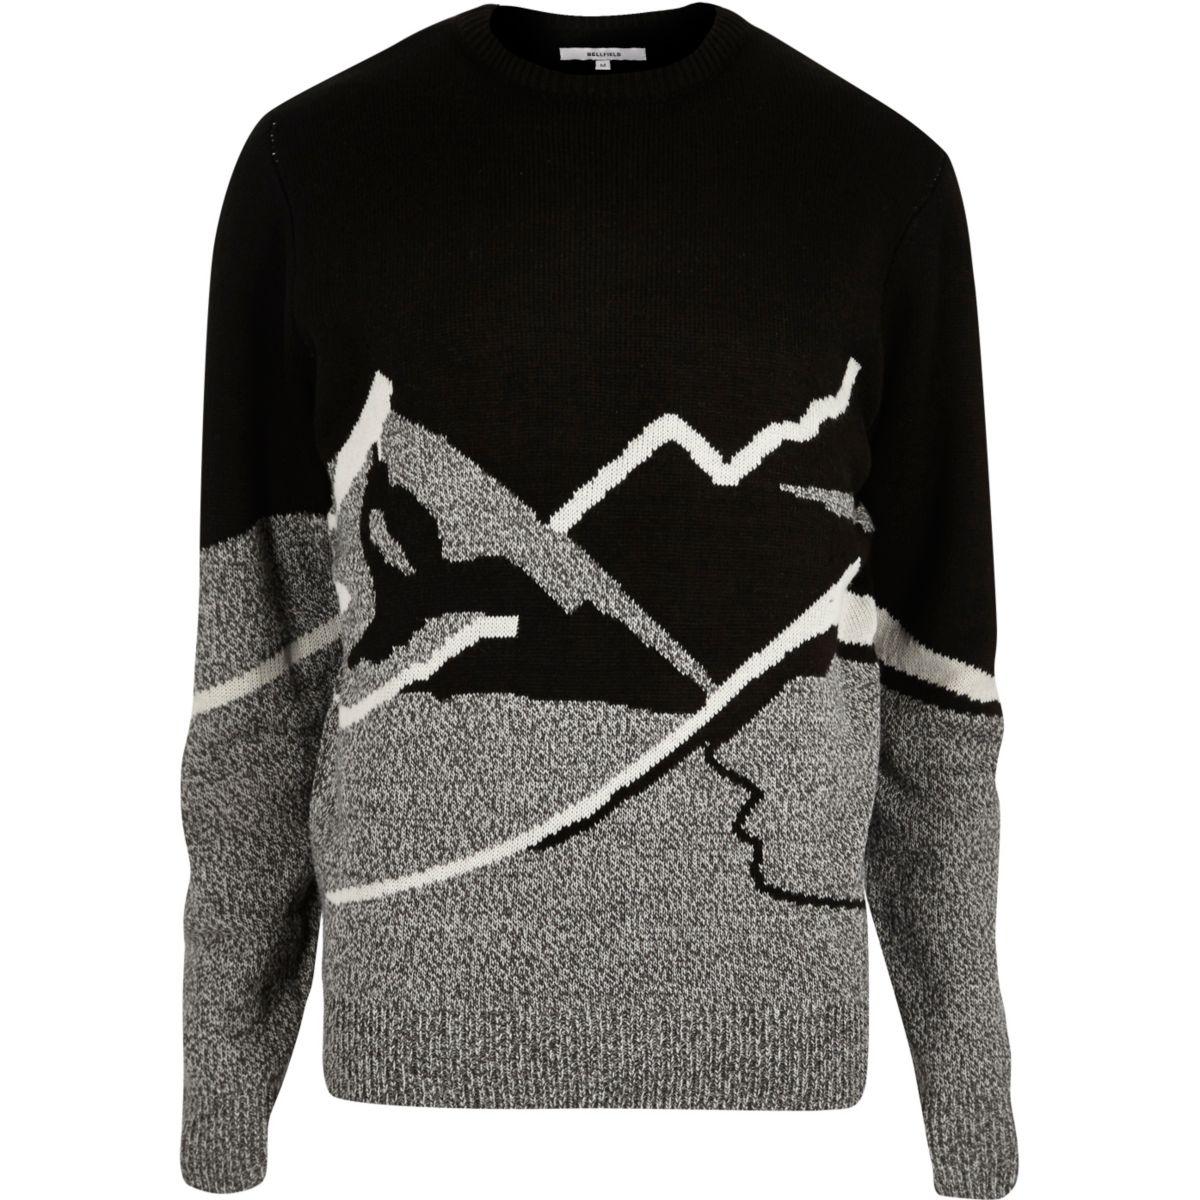 Bellfield black mountain Christmas jumper